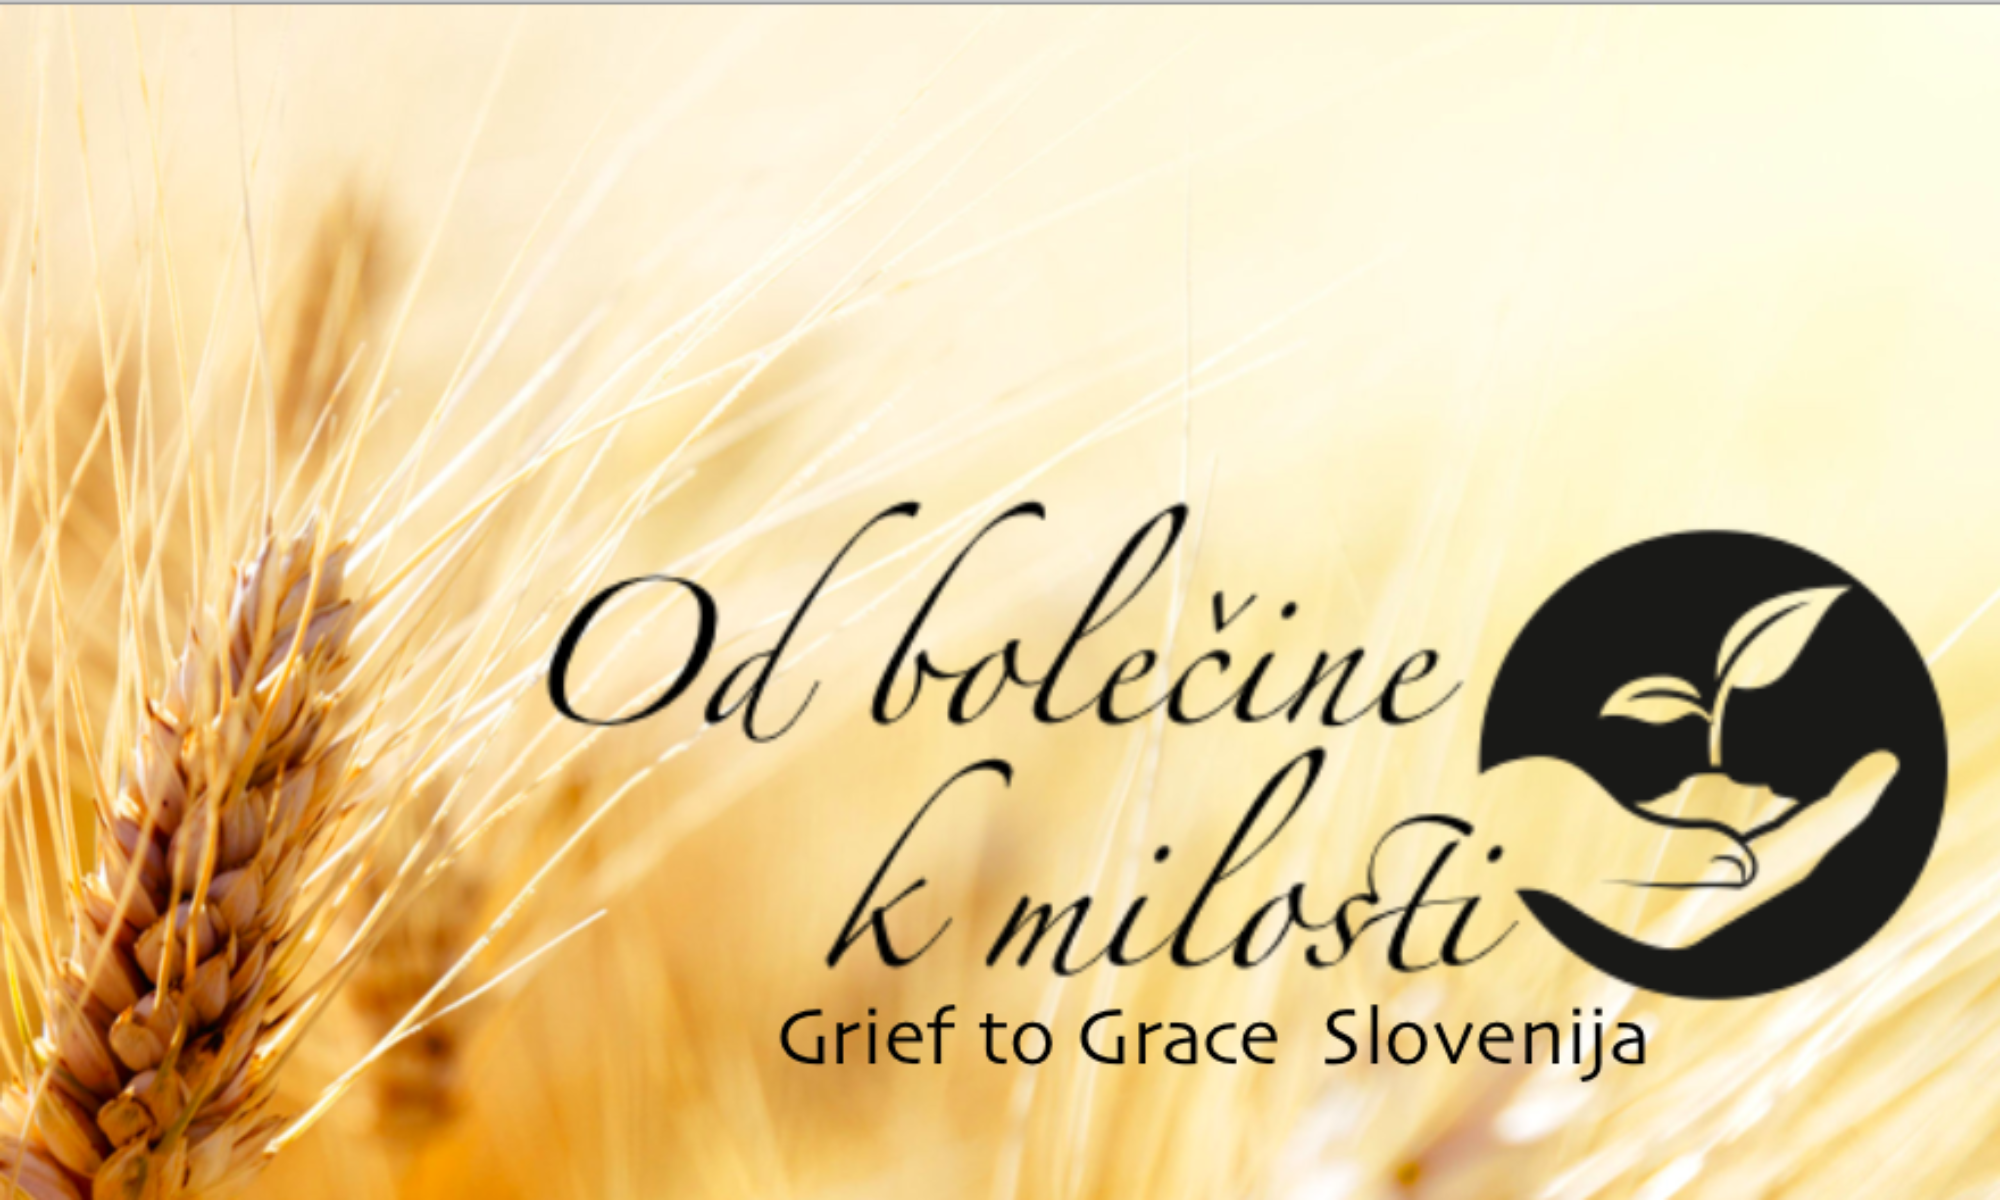 Od bolečine k milosti